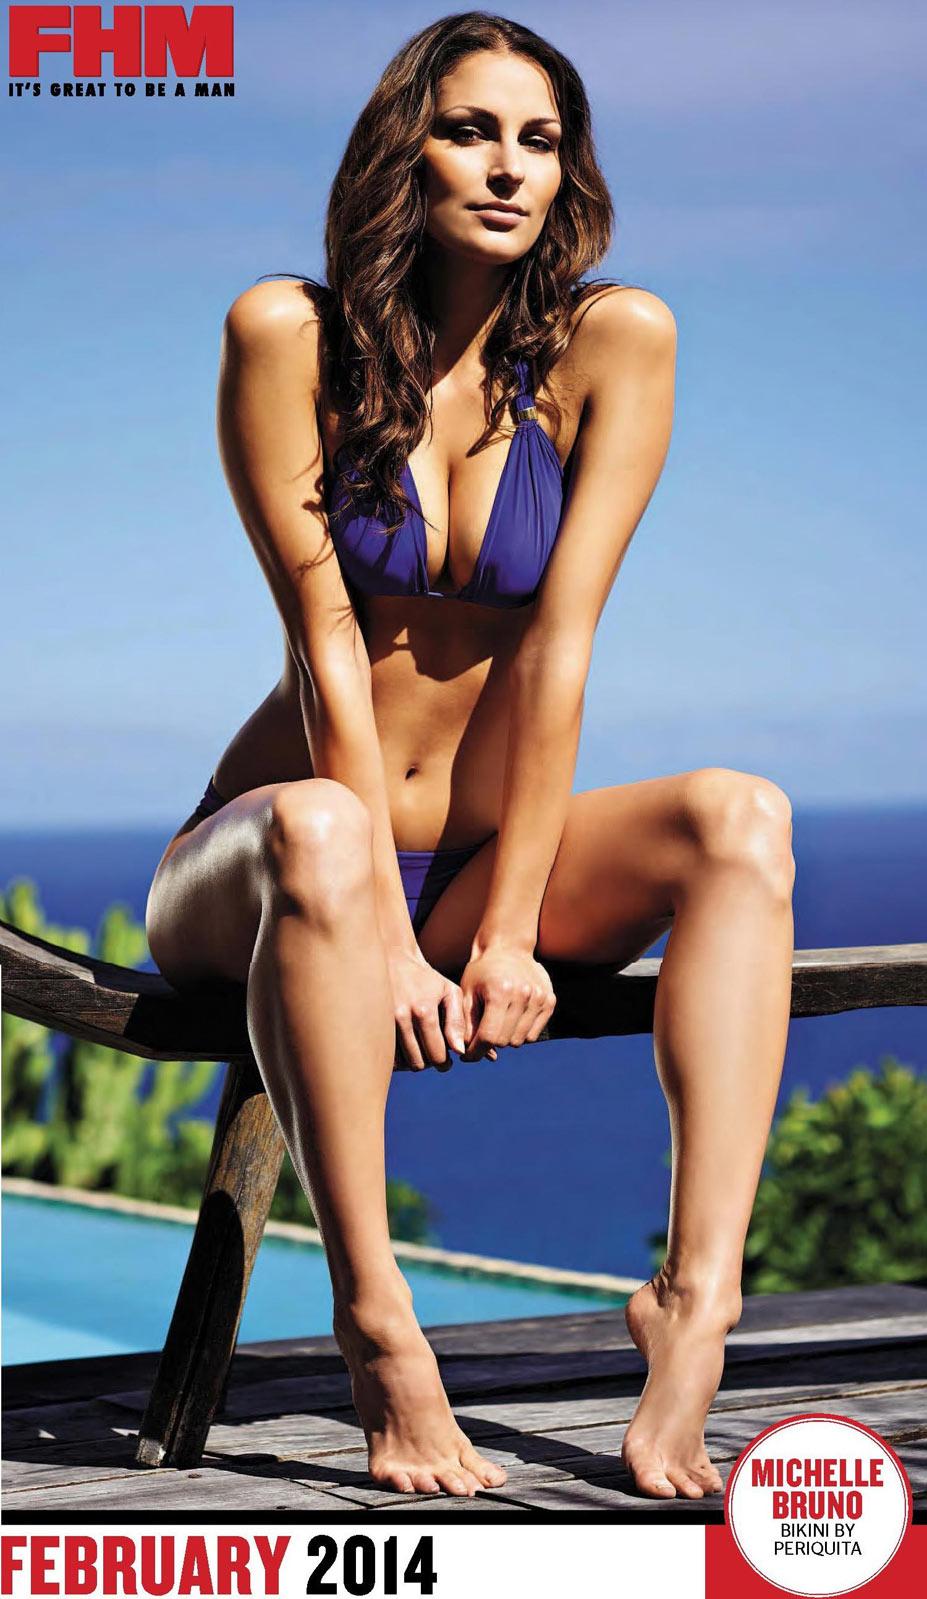 Сексуальные девушки в календаре журнала FHM South Africa 2014 - Michelle Bruno